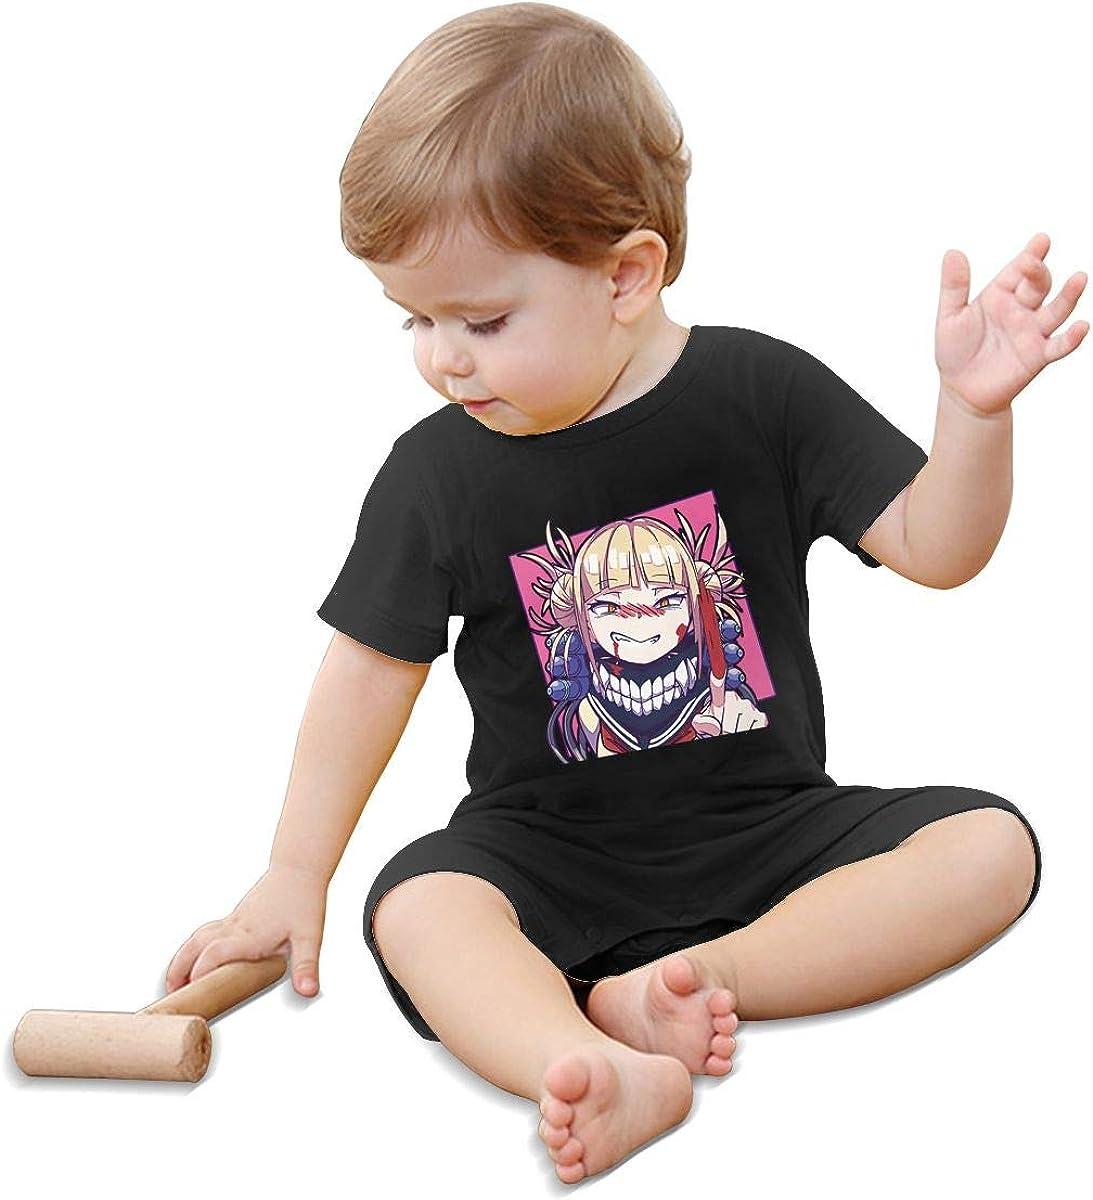 Qwertyi Baby My Hero Academia-Himiko Toga Short Sleeve Jumpsuit